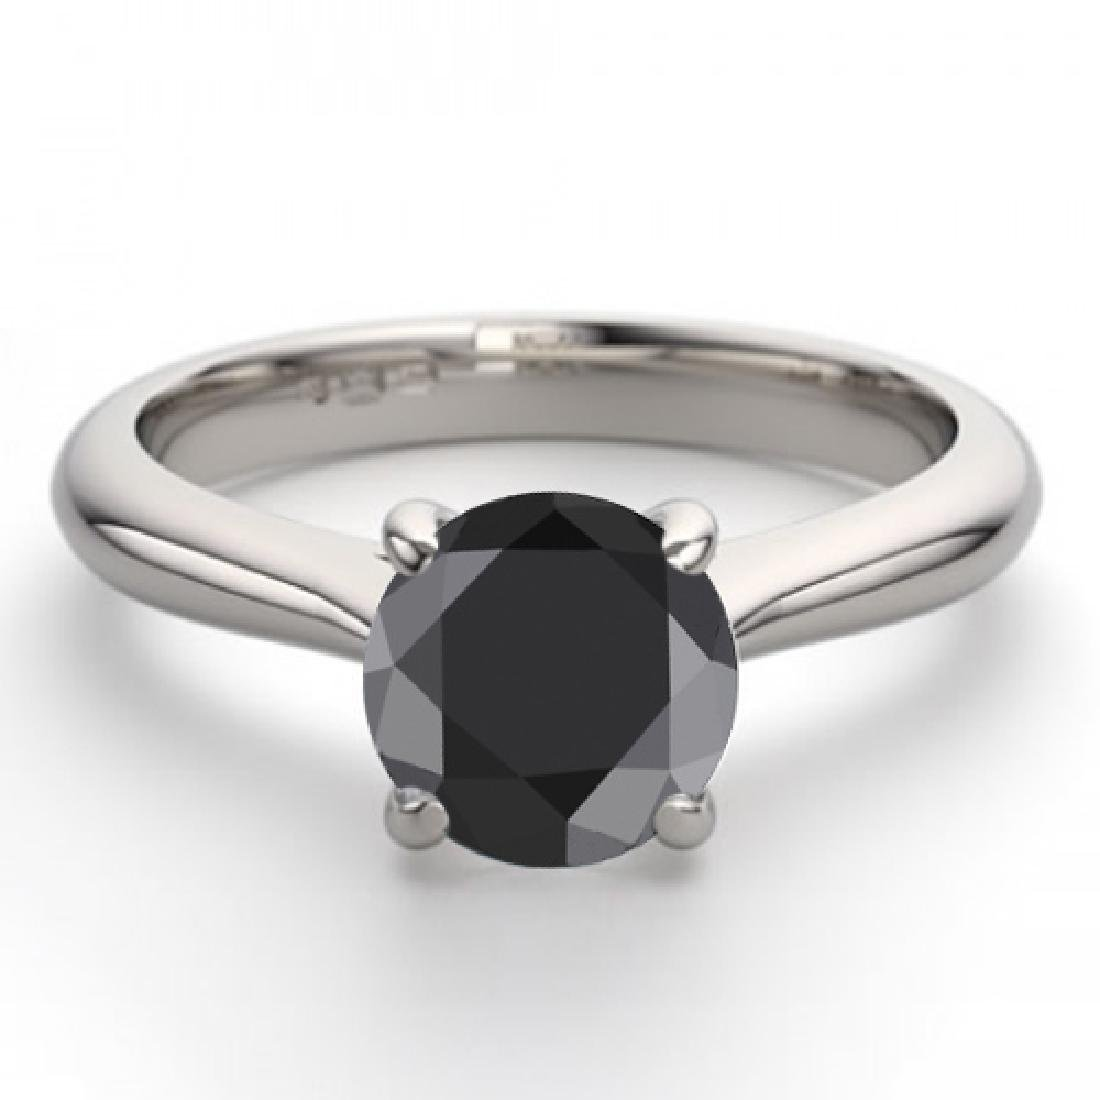 14K White Gold Jewelry 1.02 ctw Black Diamond Solitaire